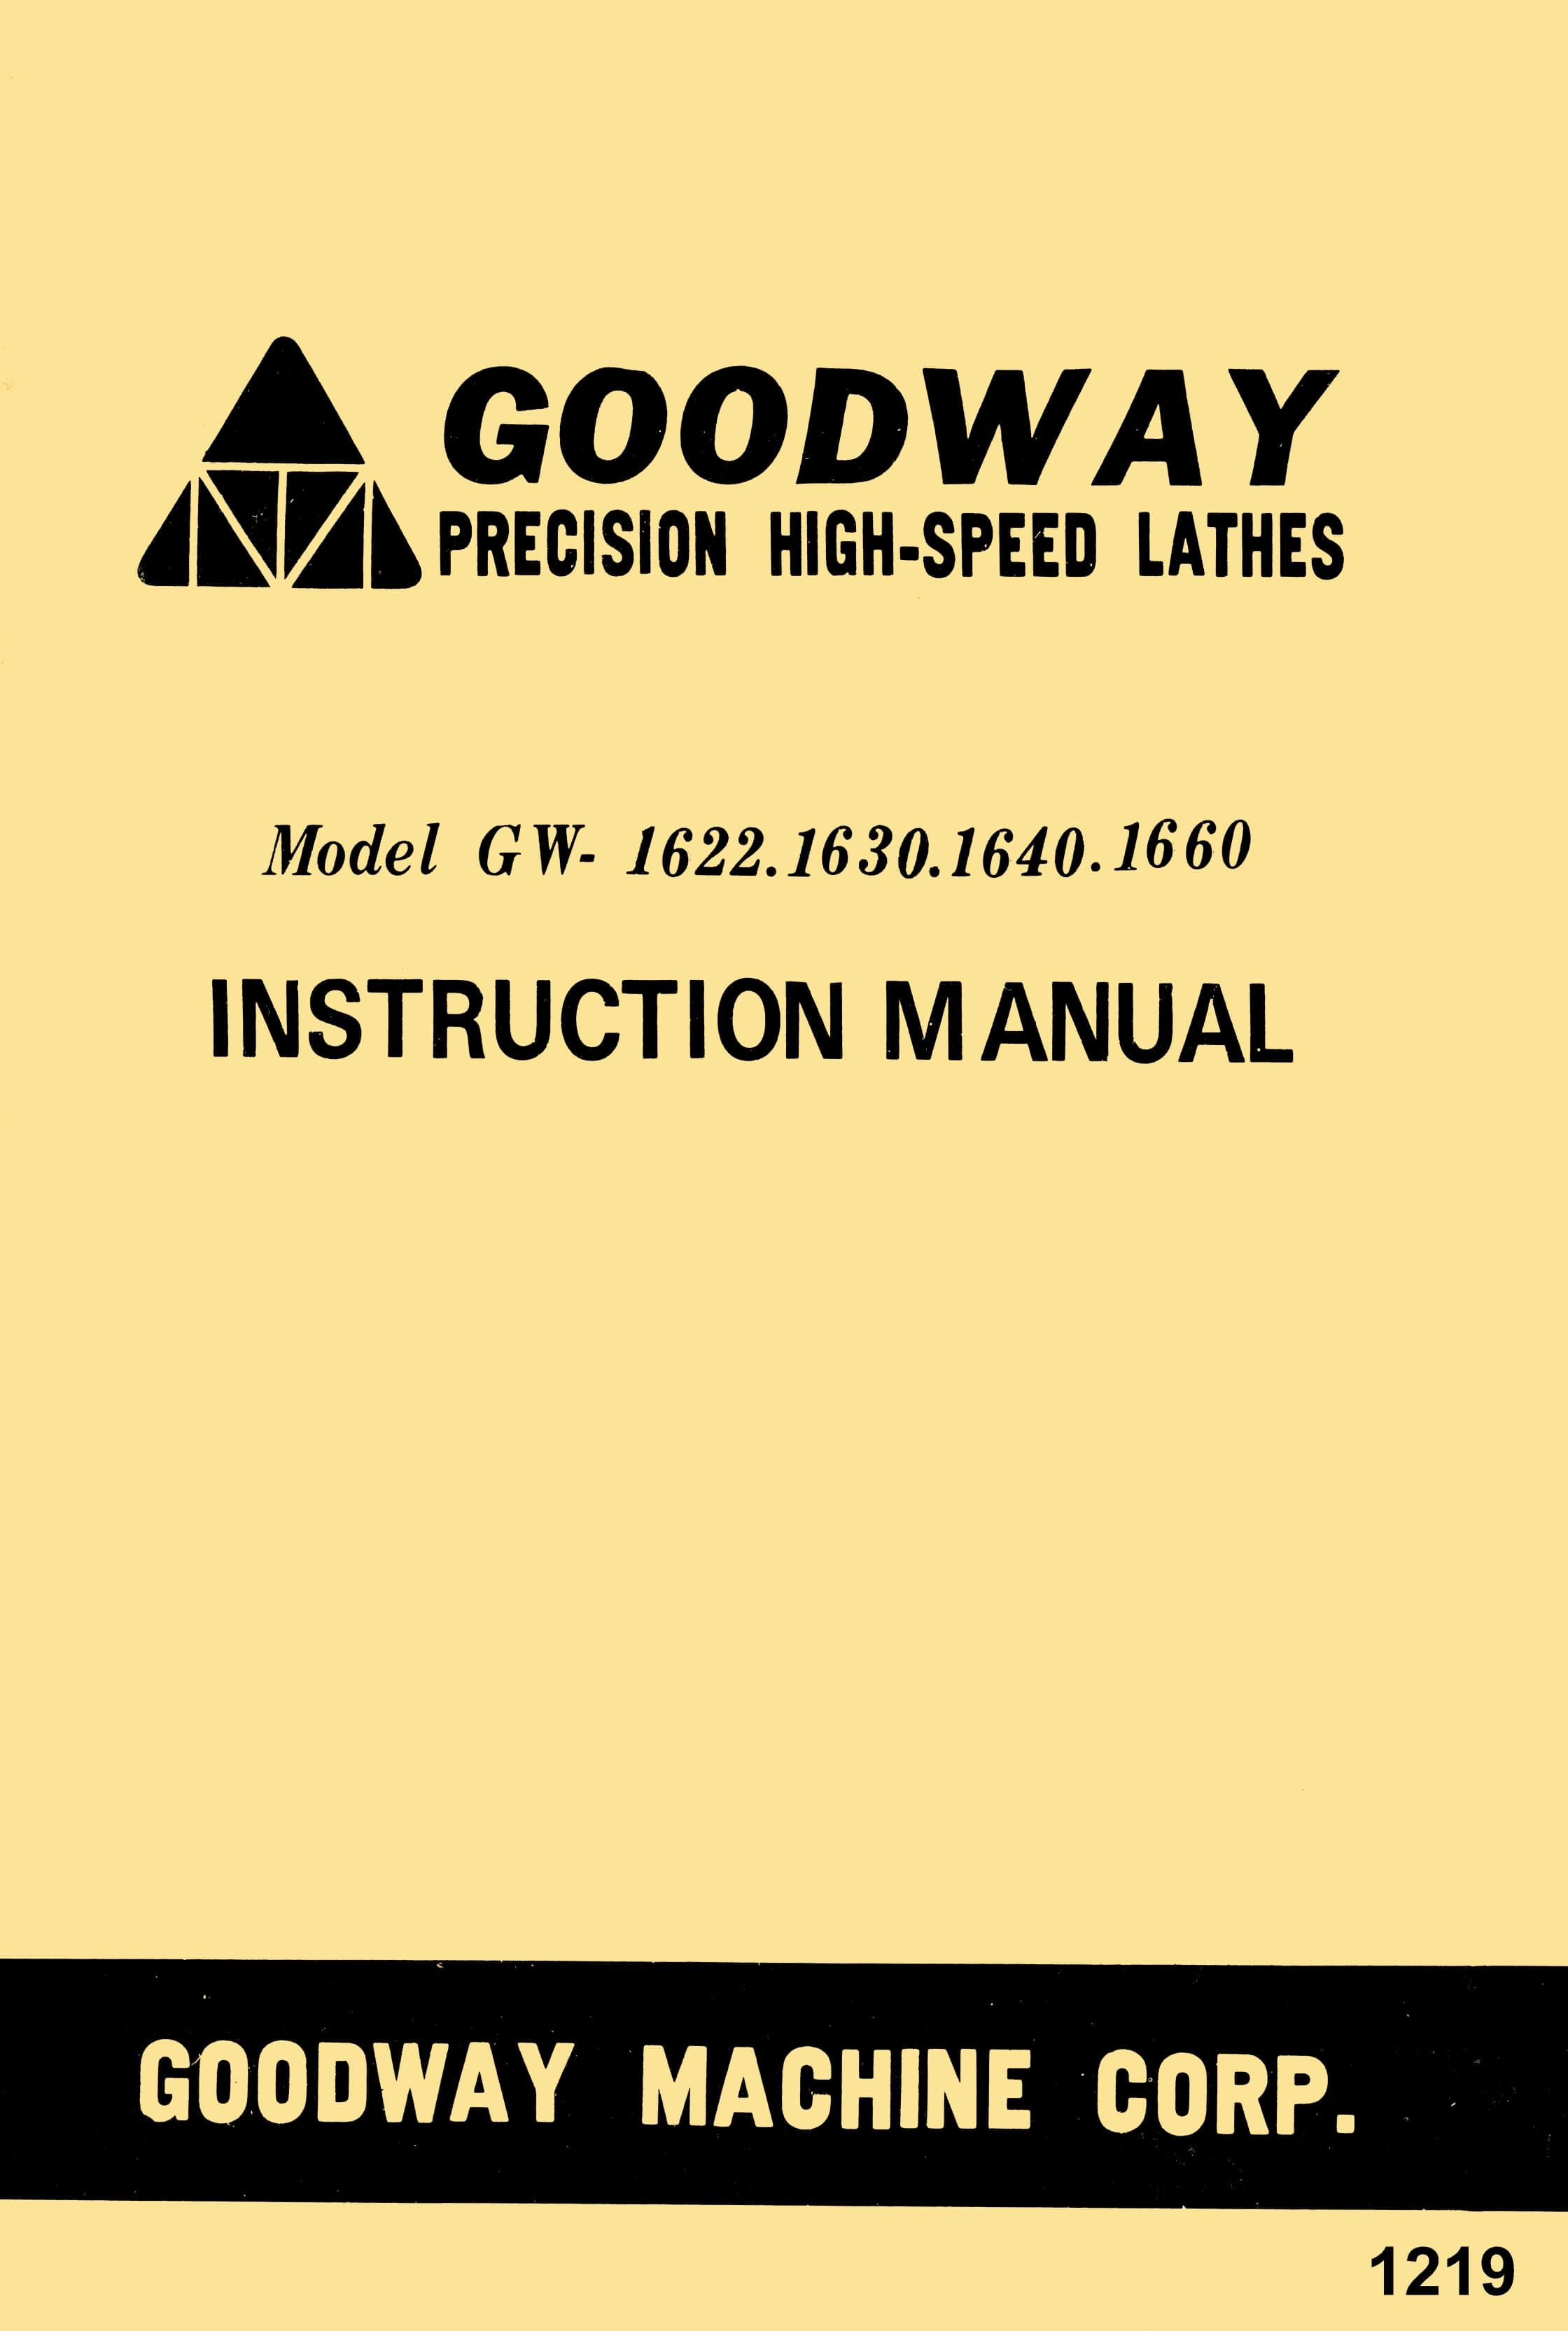 GOODWAY GW-1622,1630,1640,1660 Metal Lathe Instructions Manual - https